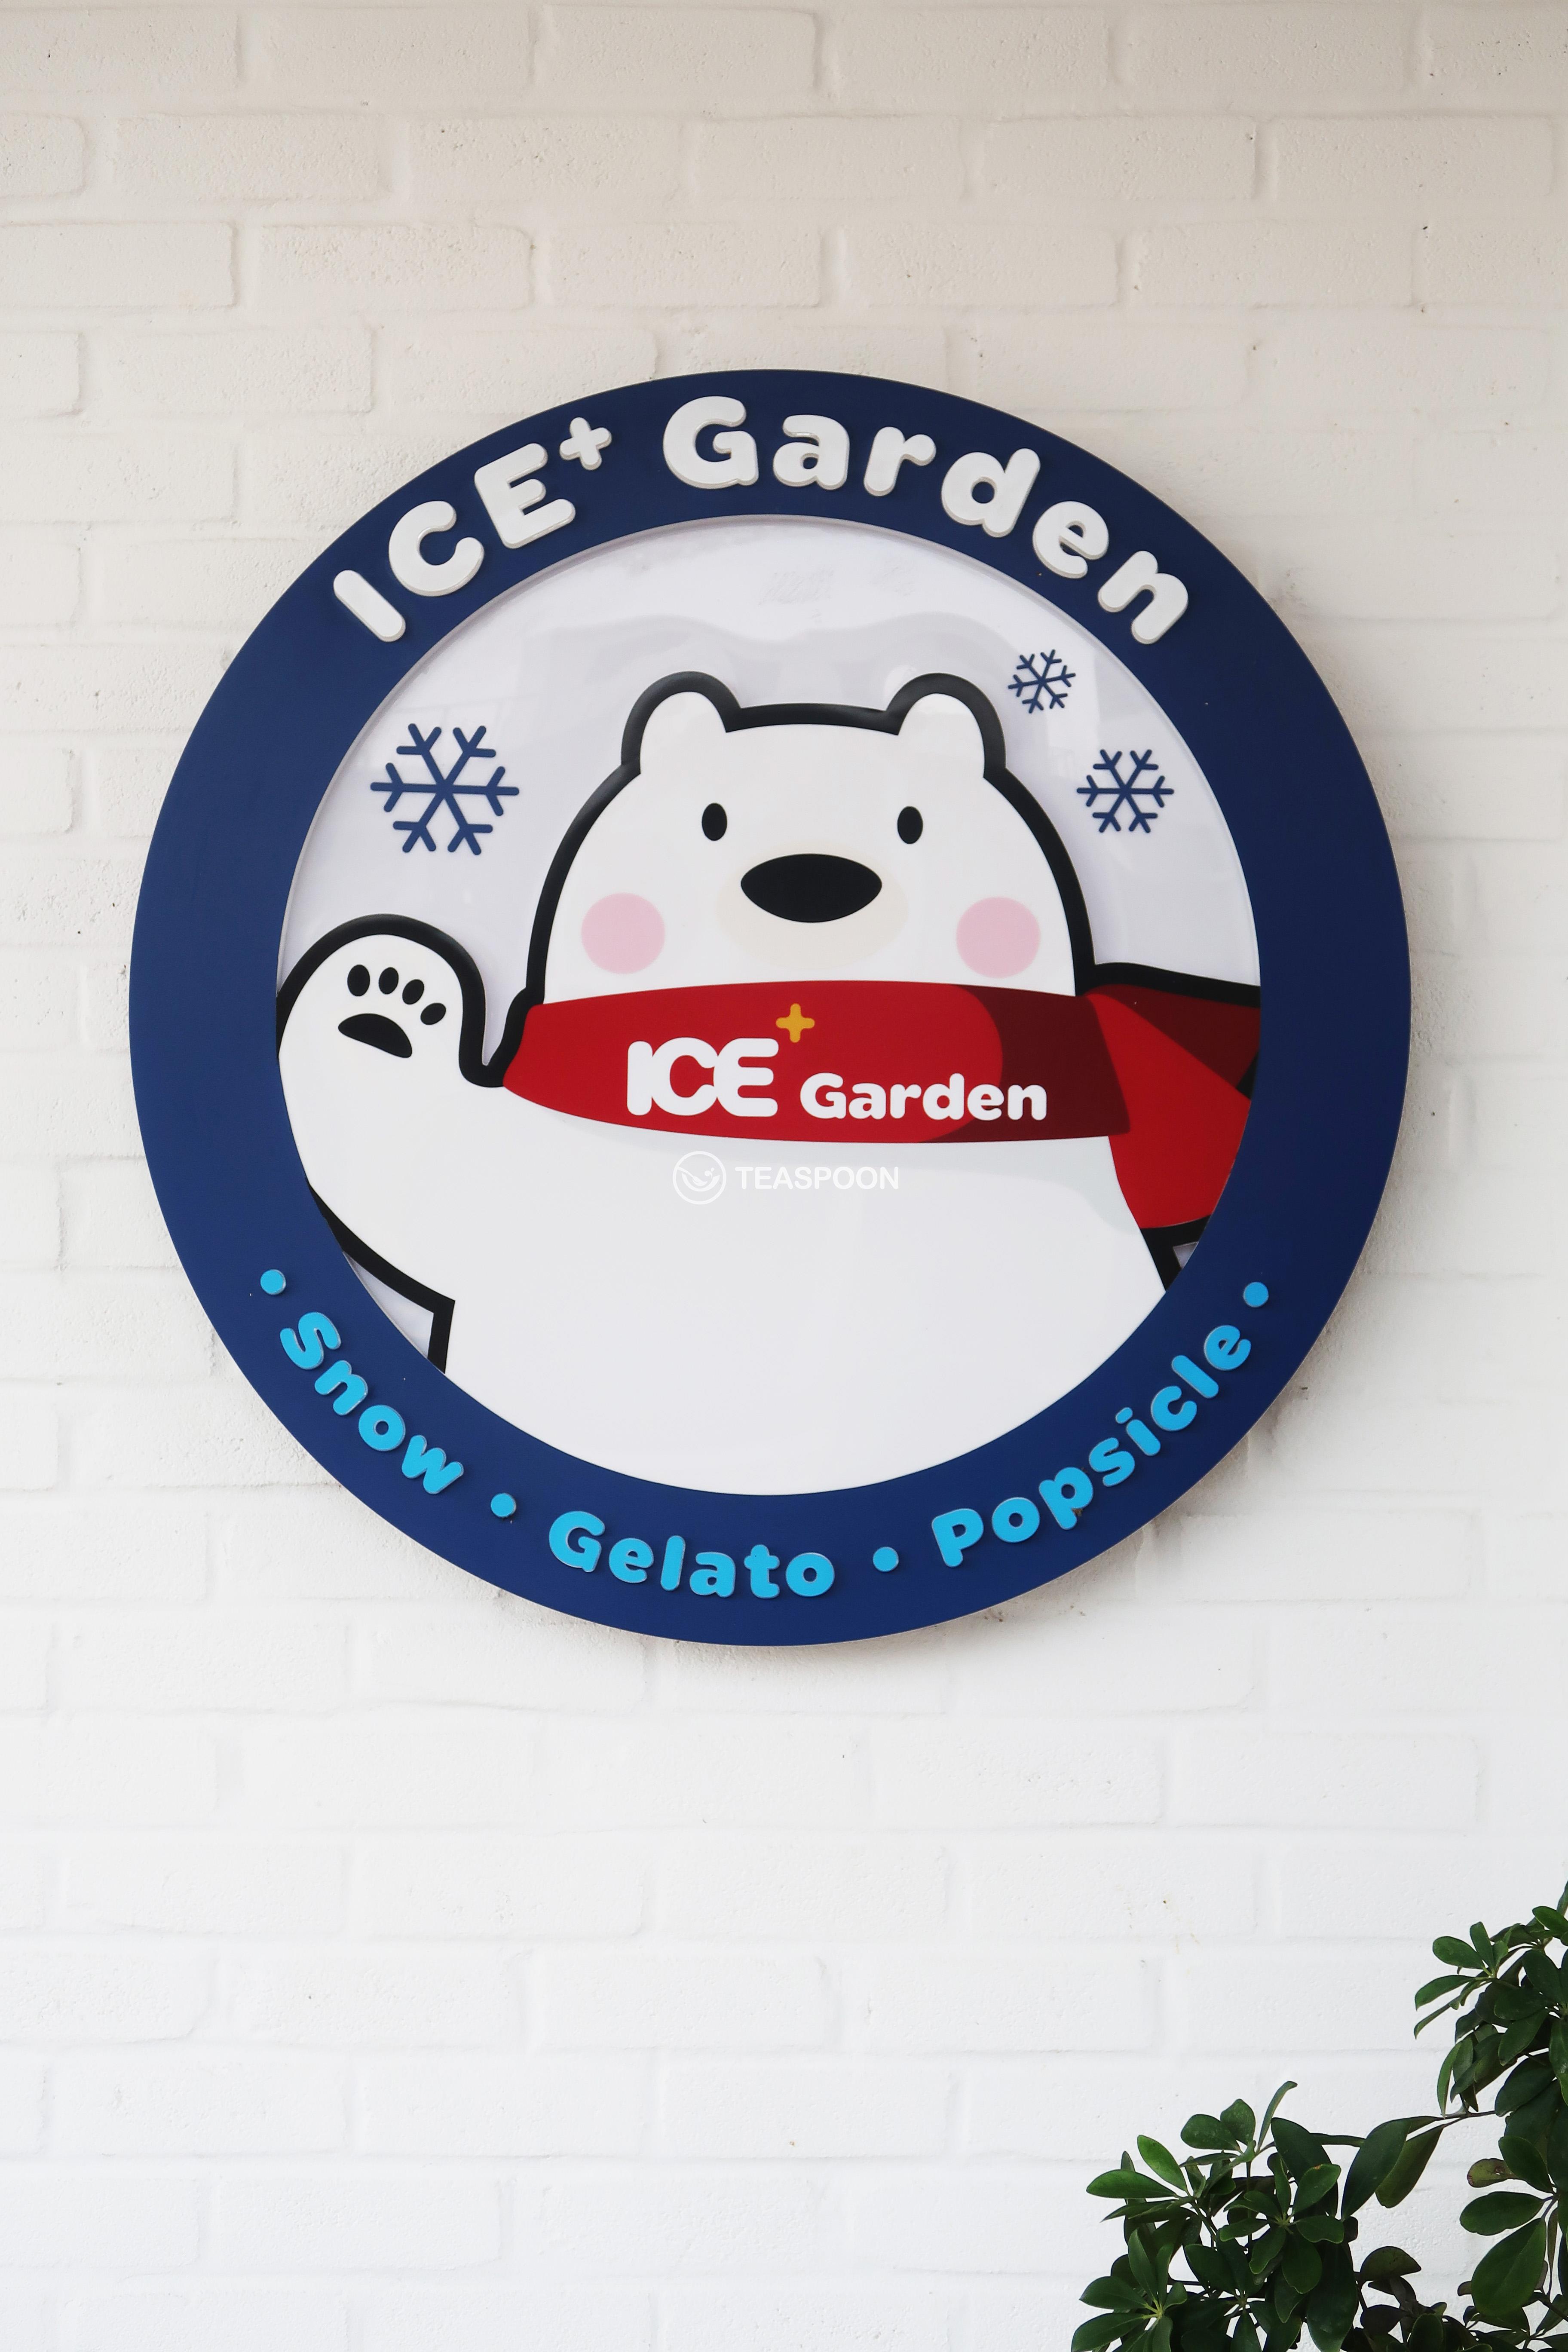 Ice Plus Garden (1)